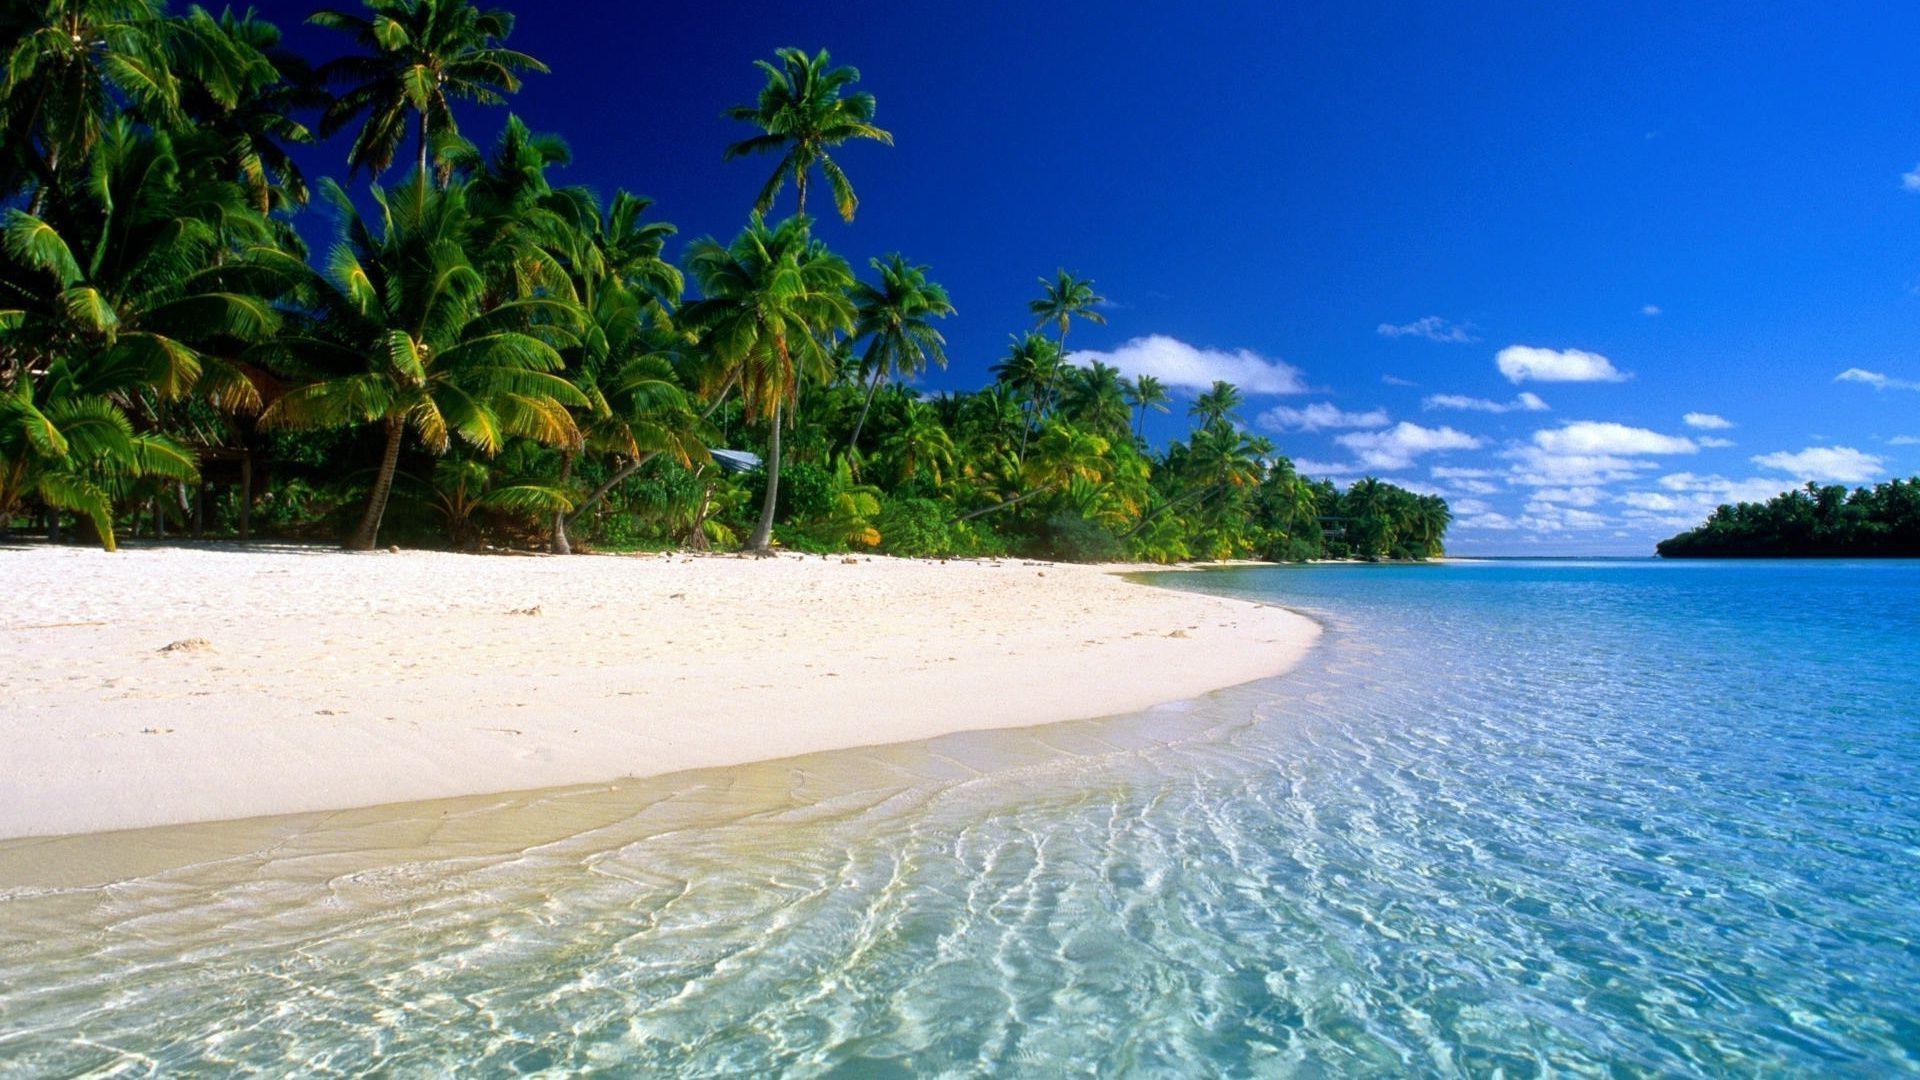 beach wallpaper for desktop background 57 images